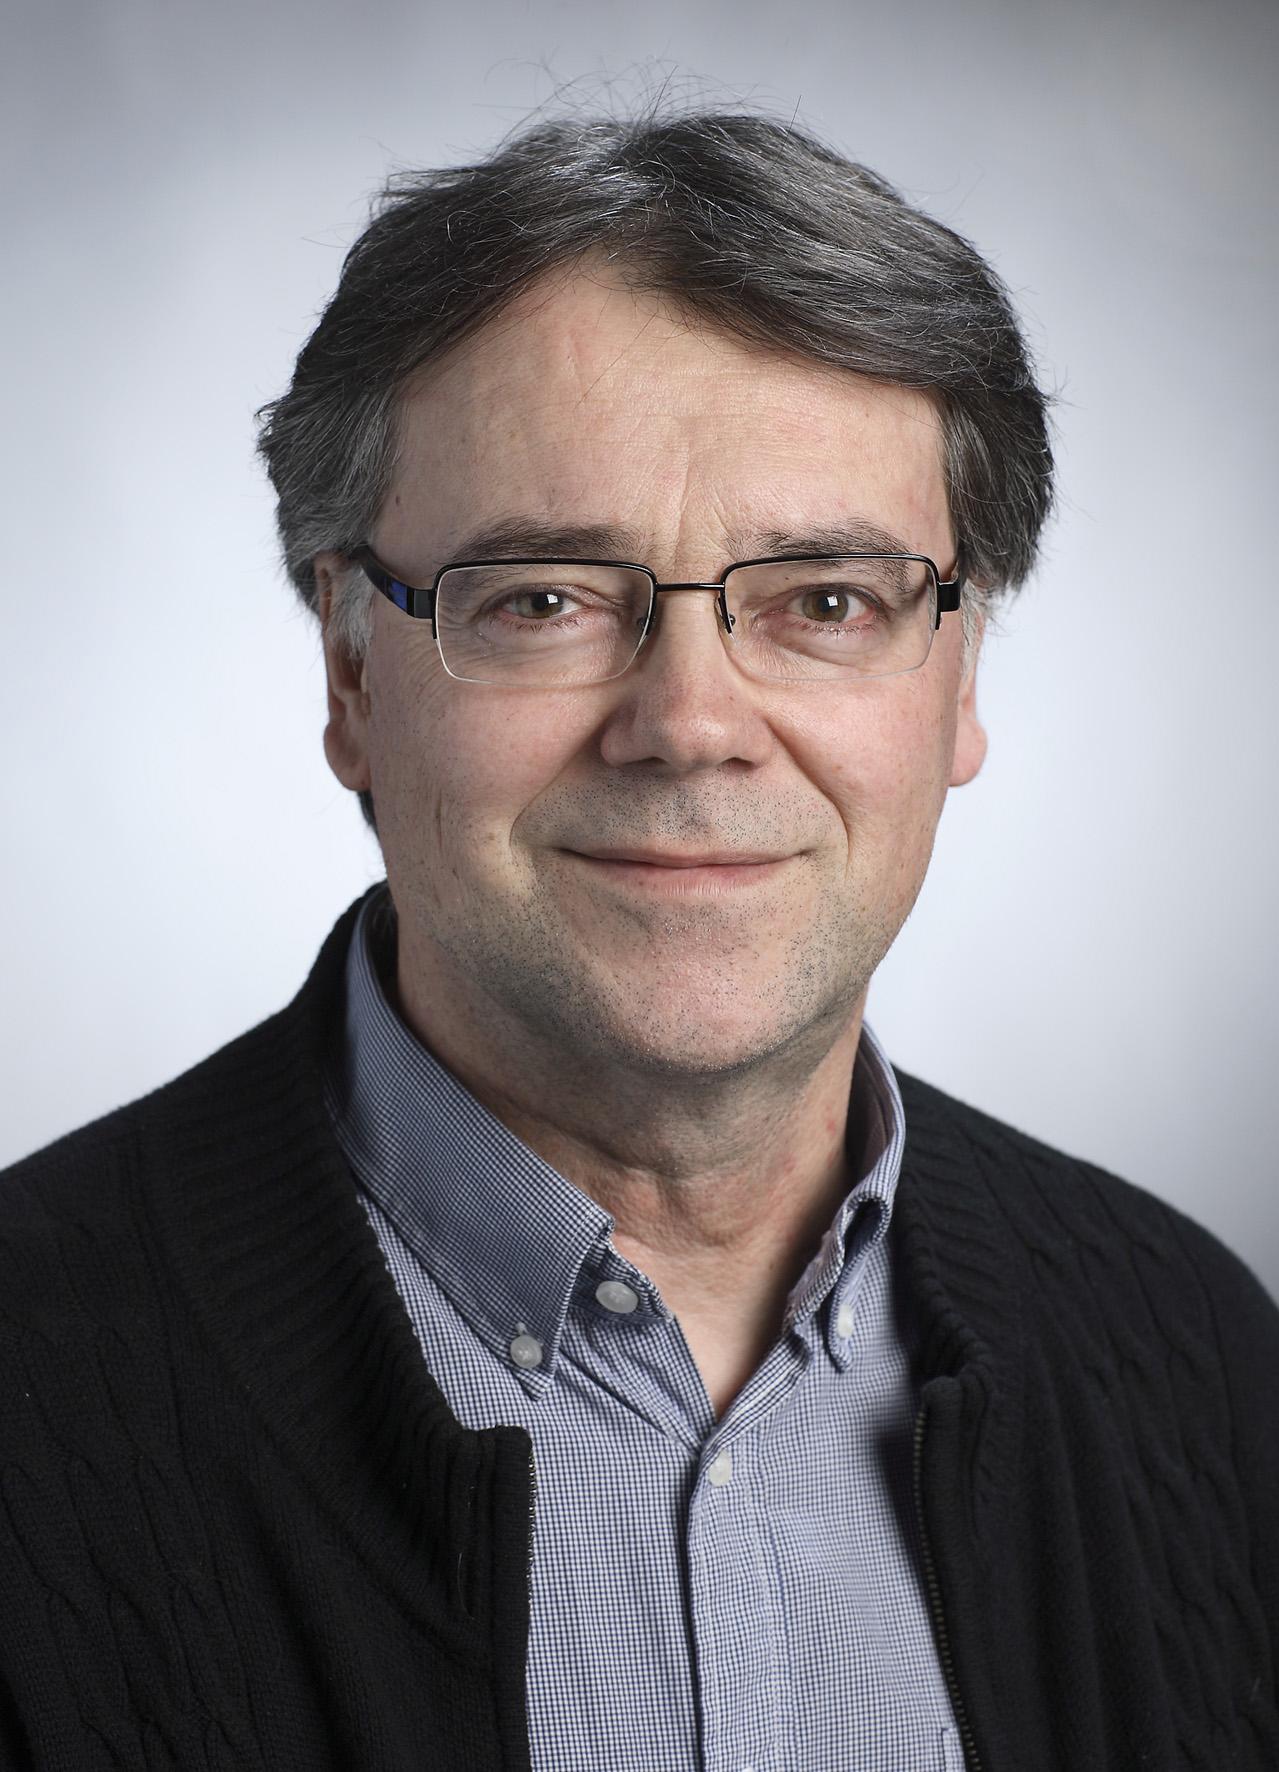 Harry Schulman